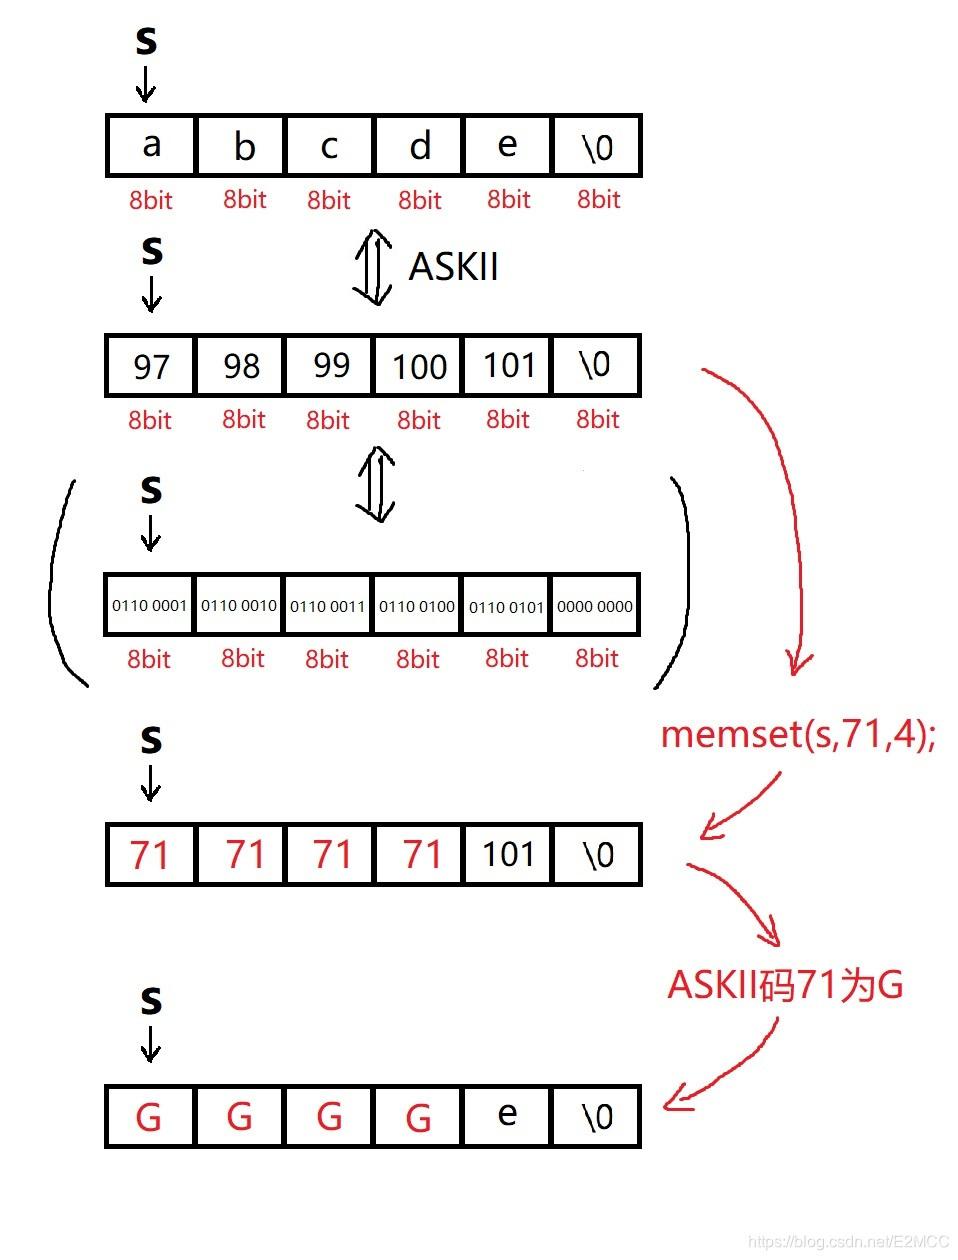 memset函数char类型